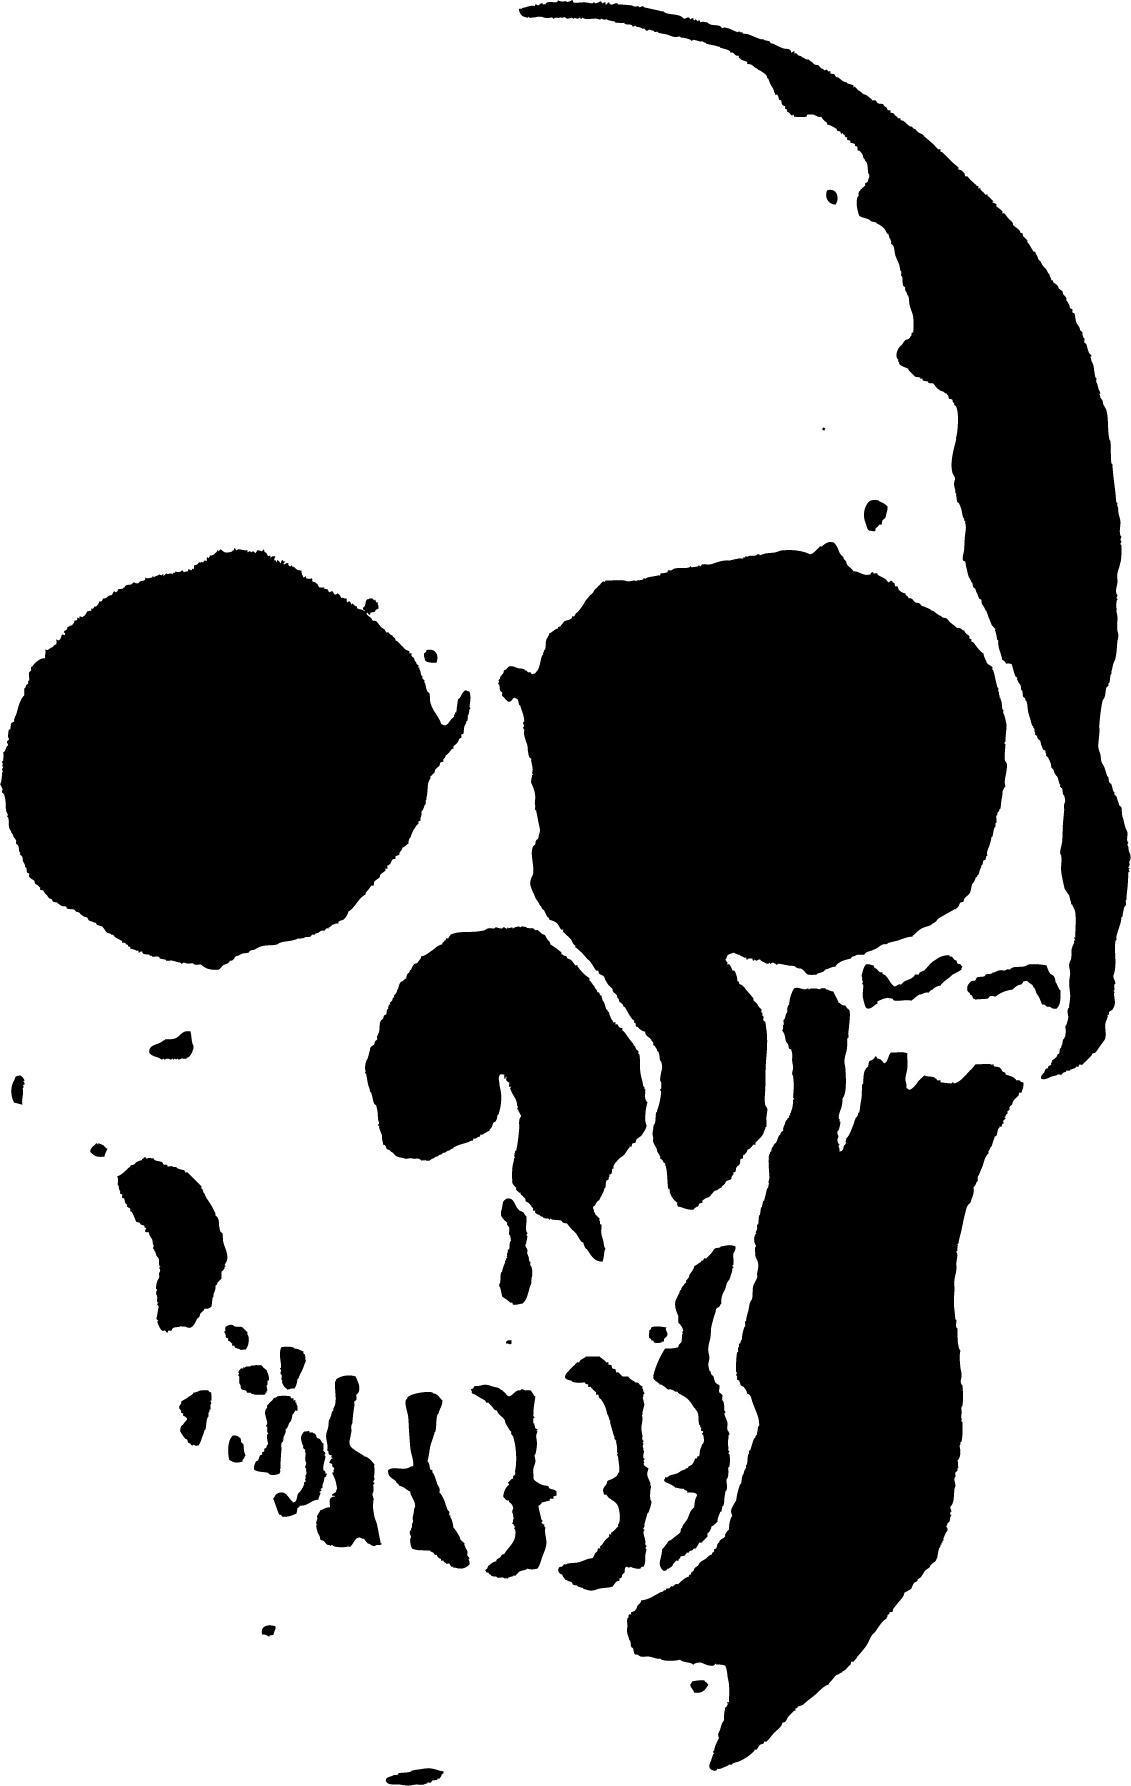 23 Free Skull Stencil Printable Templates | Guide Patterns - Skull Stencils Free Printable